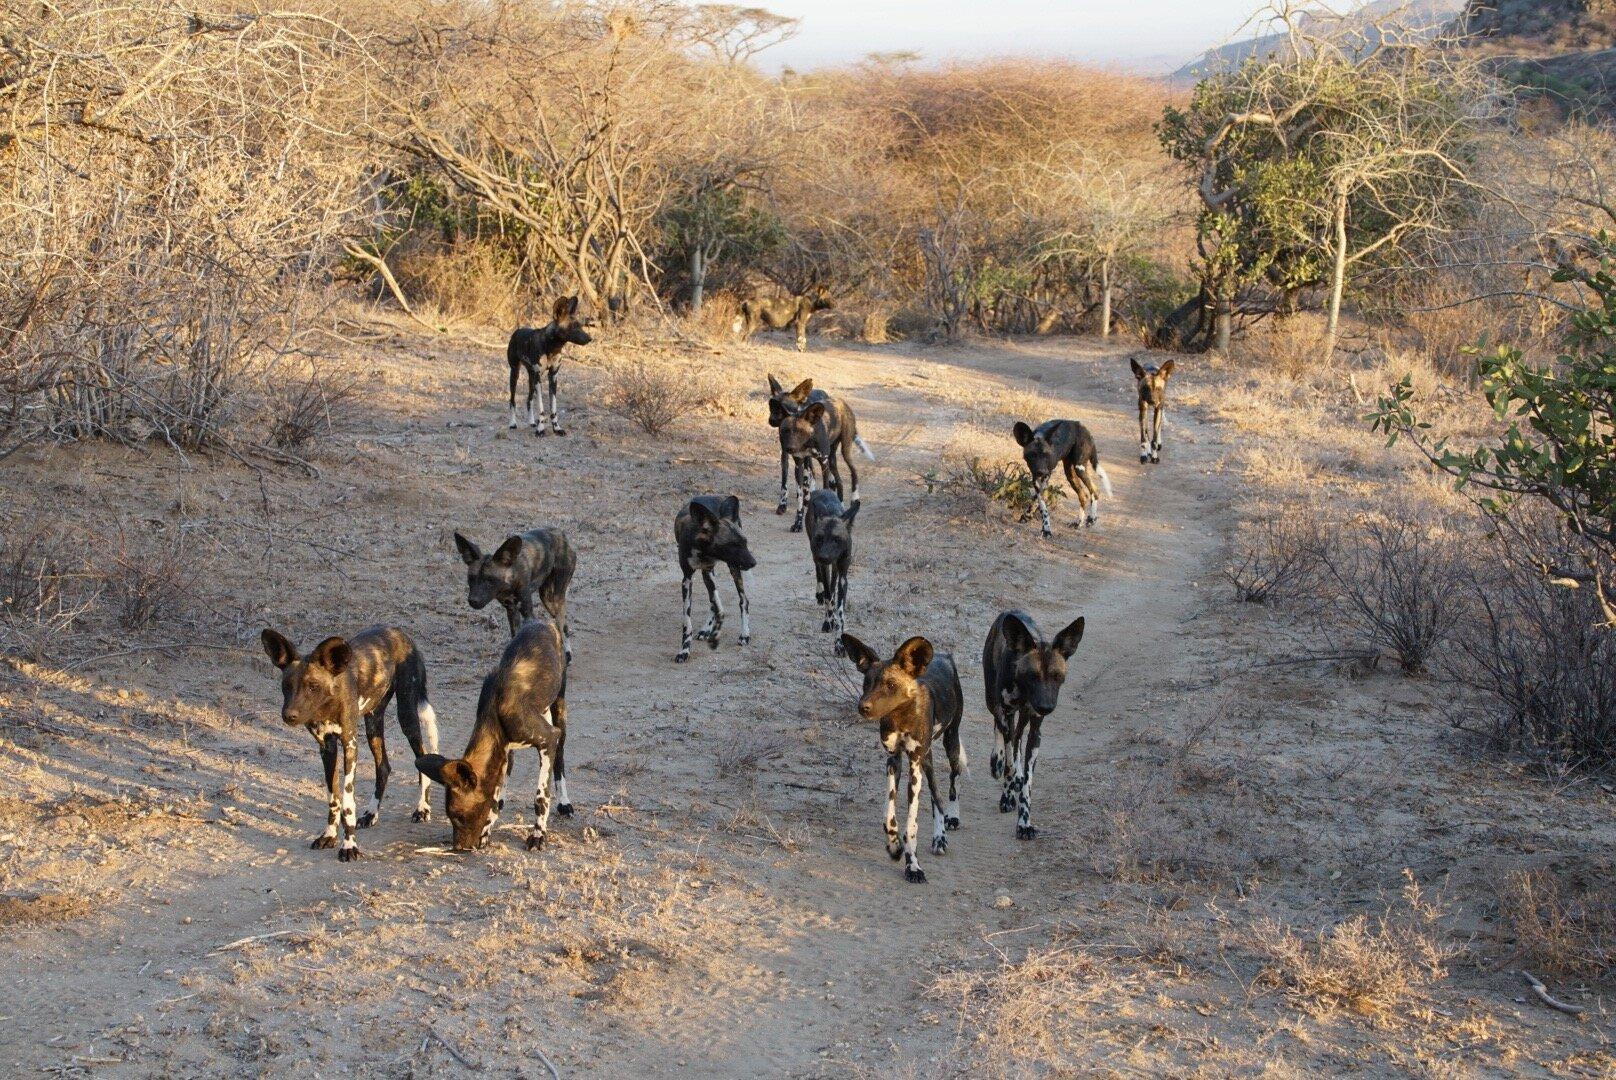 Wild Dogs - Rare sight!